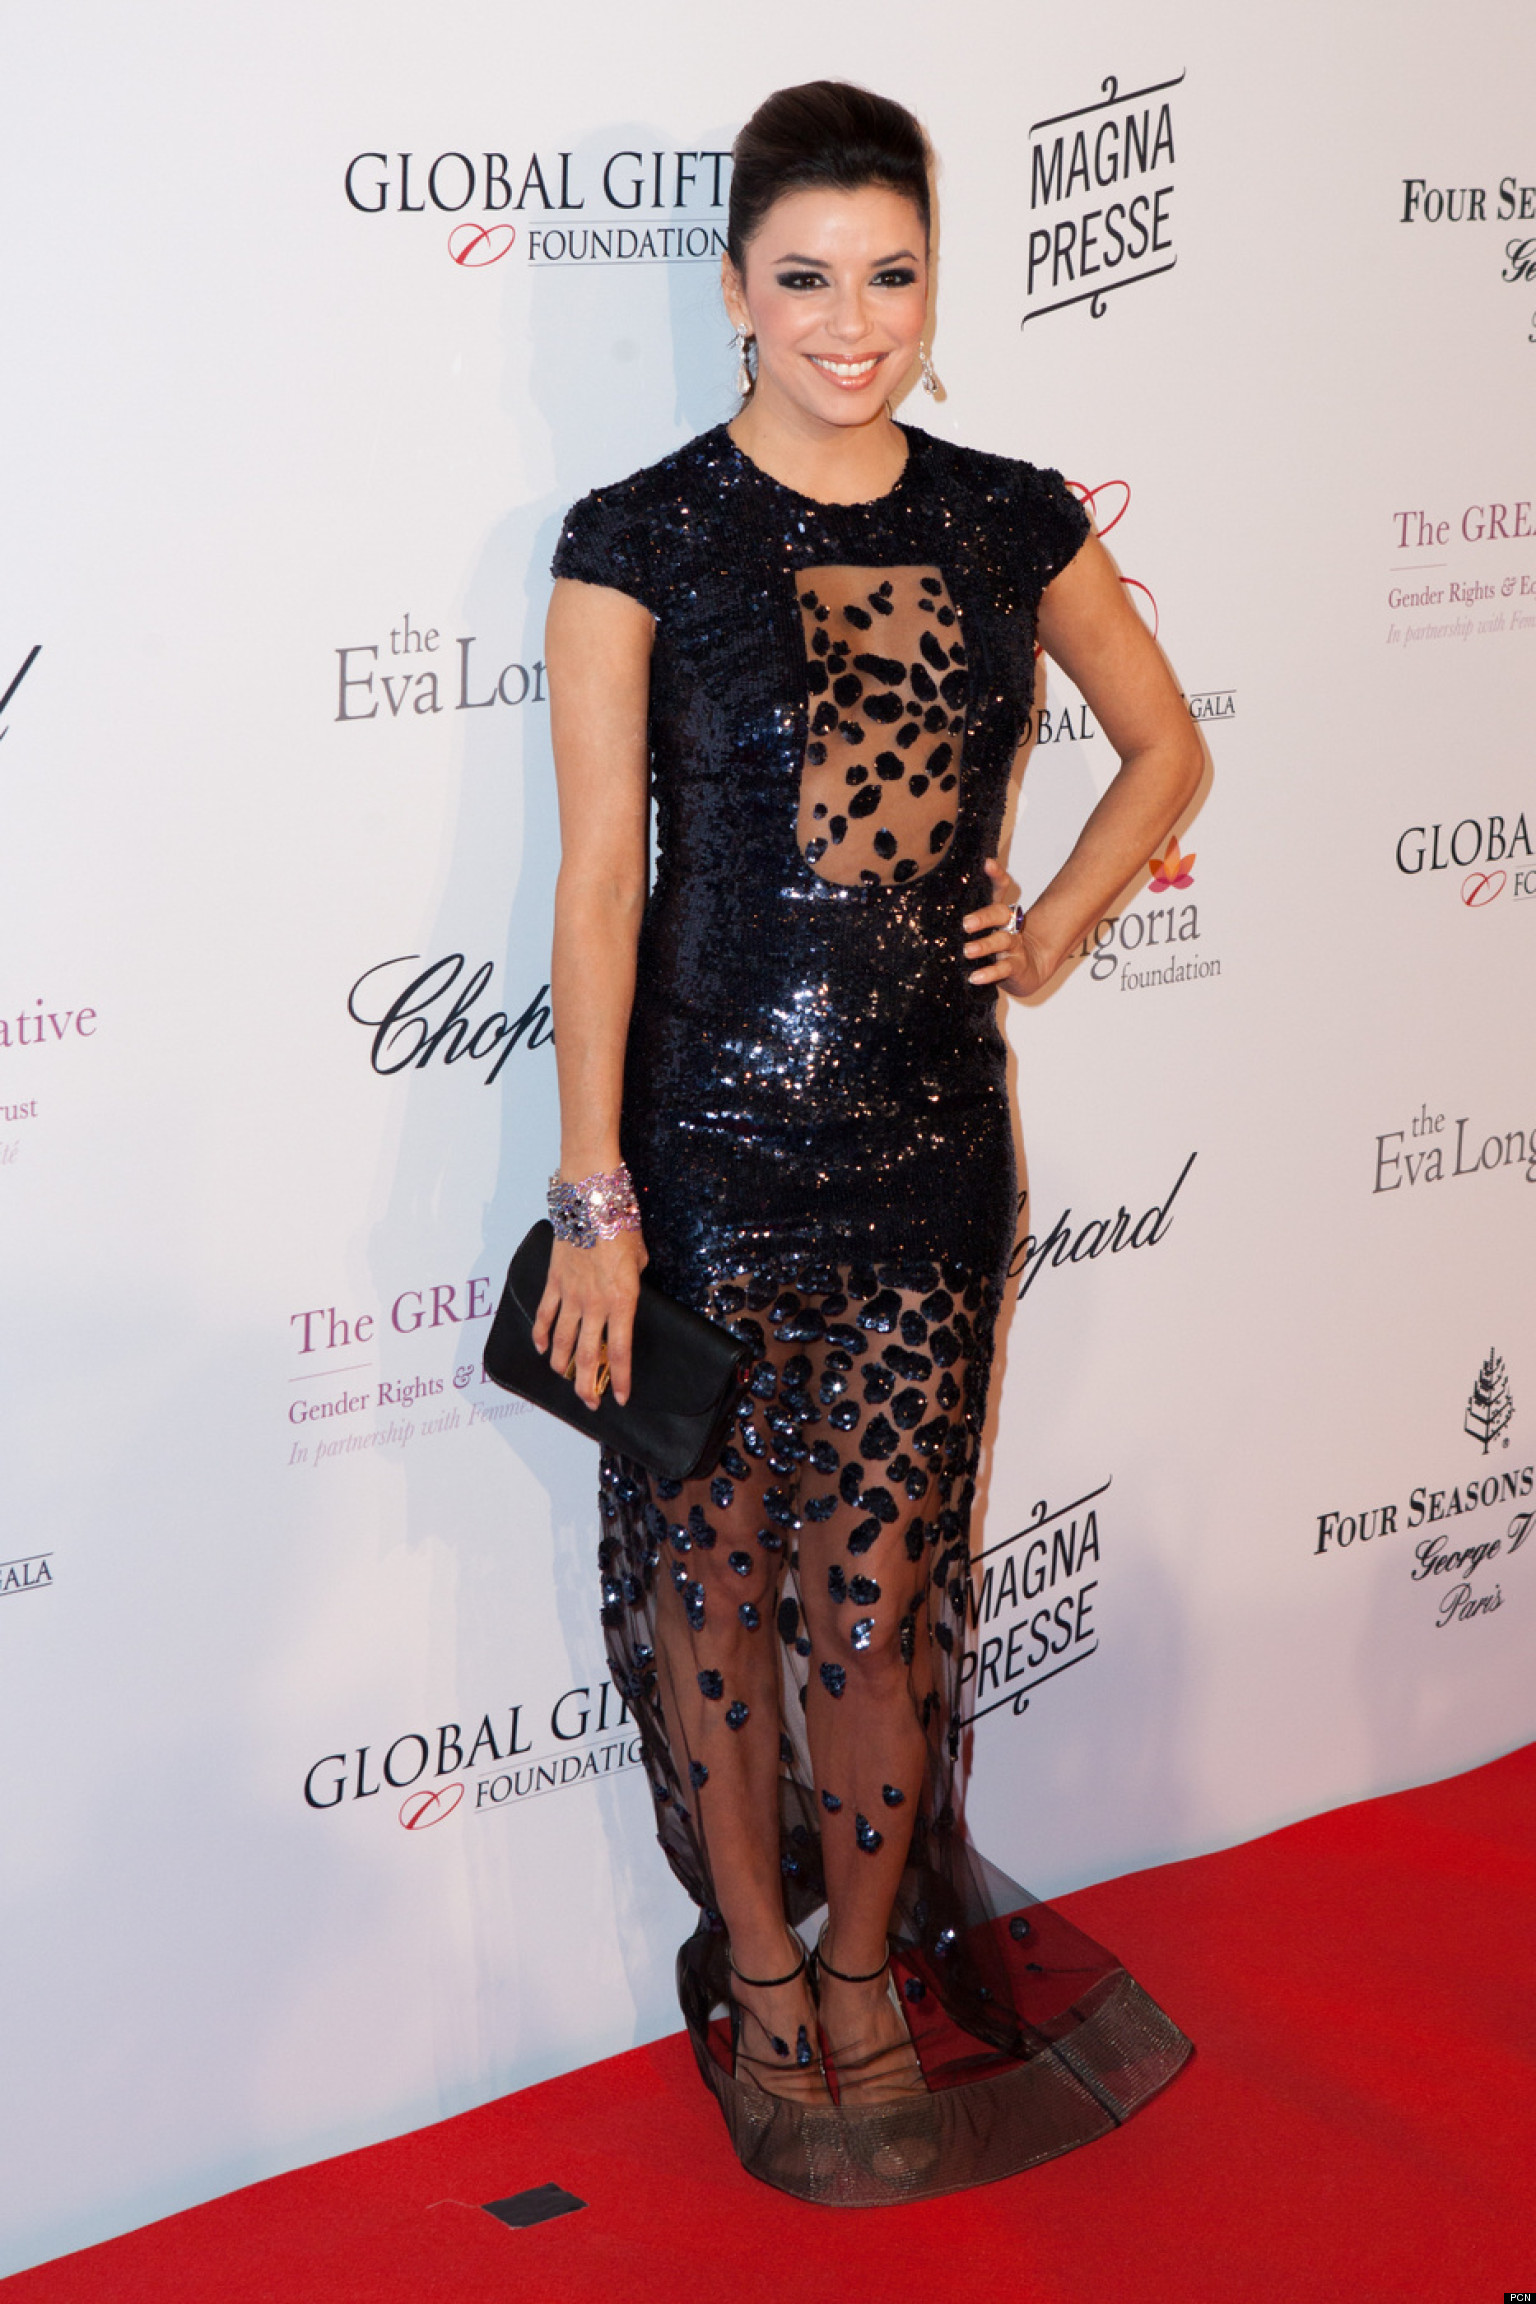 Eva Longoria Shows Odd Bit Of Skin On Red Carpet